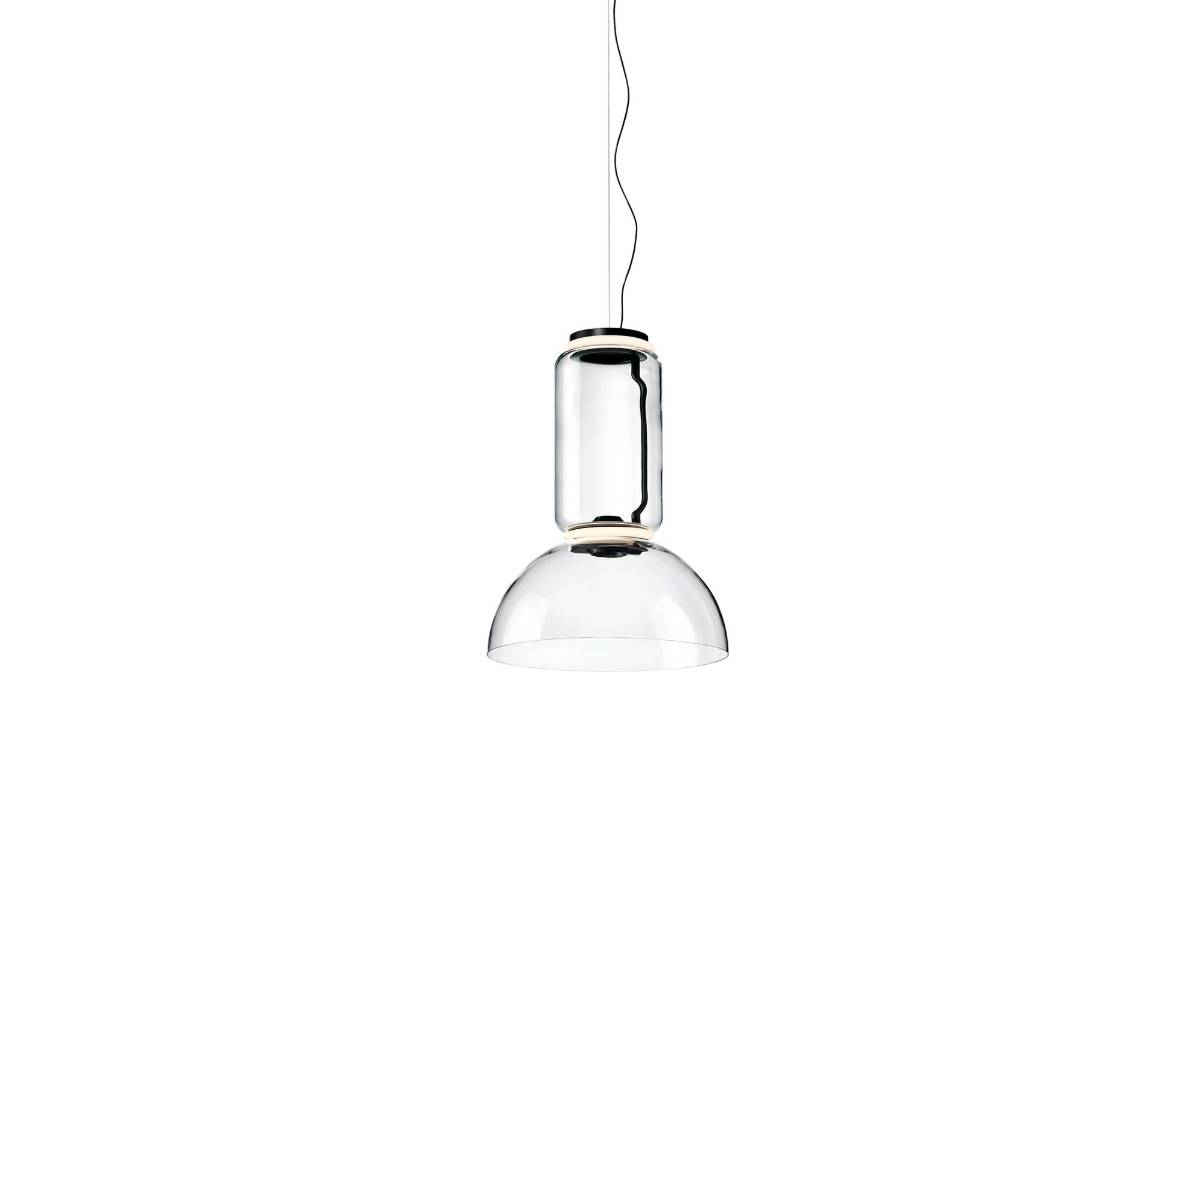 Flos Noctambule S1 Low Cylinder And Bowl Hanglamp